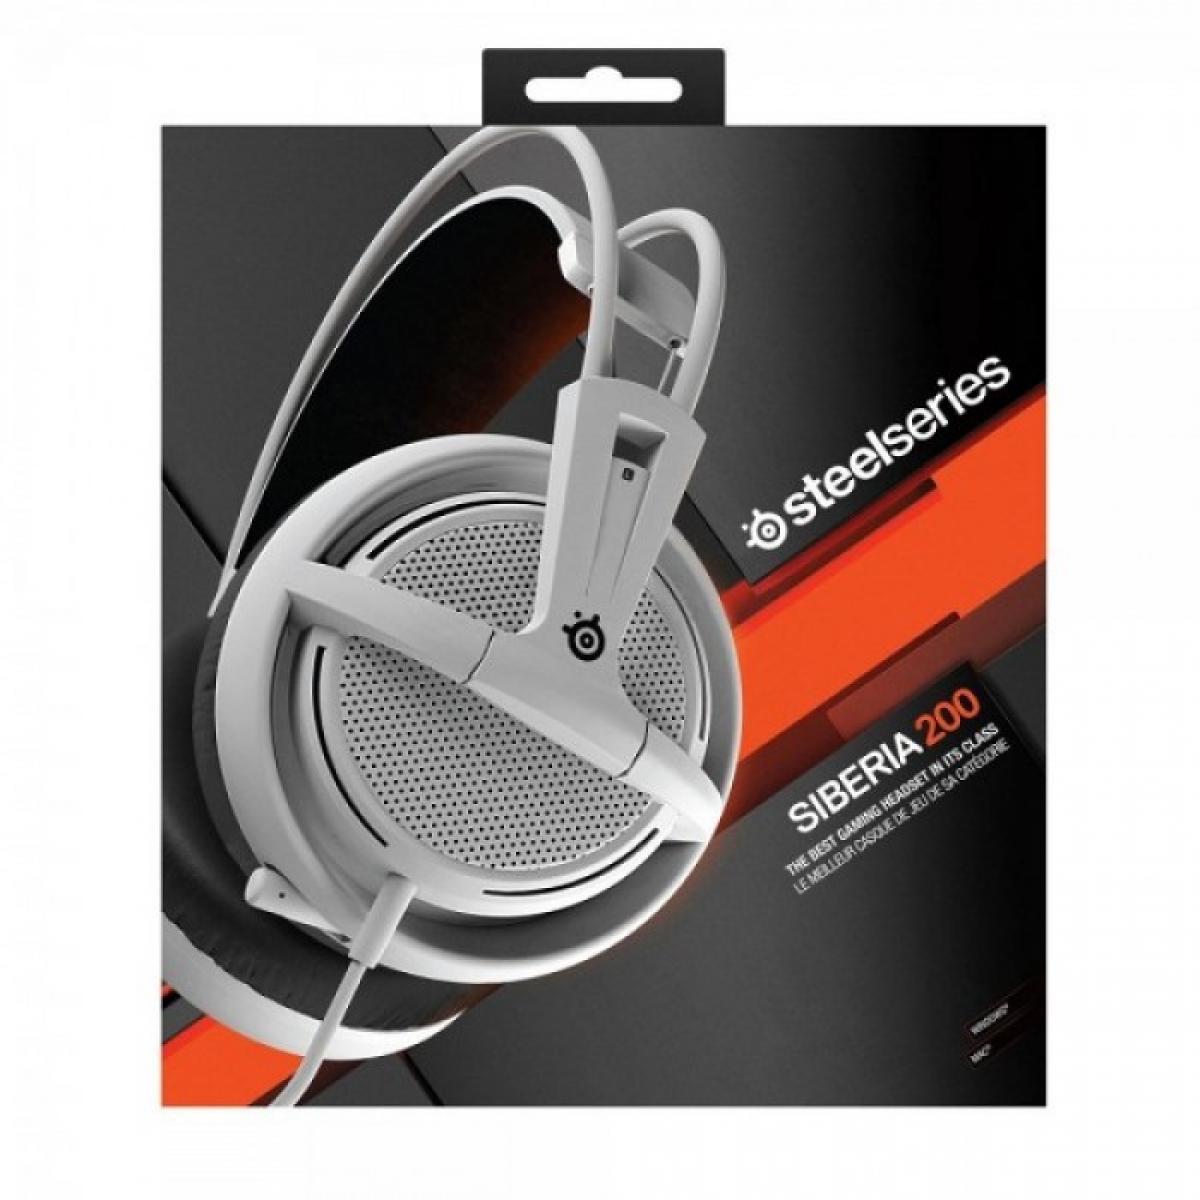 9e891aef730 SteelSeries Siberia 200 Gaming Headset - White | 51132 | City Center ...